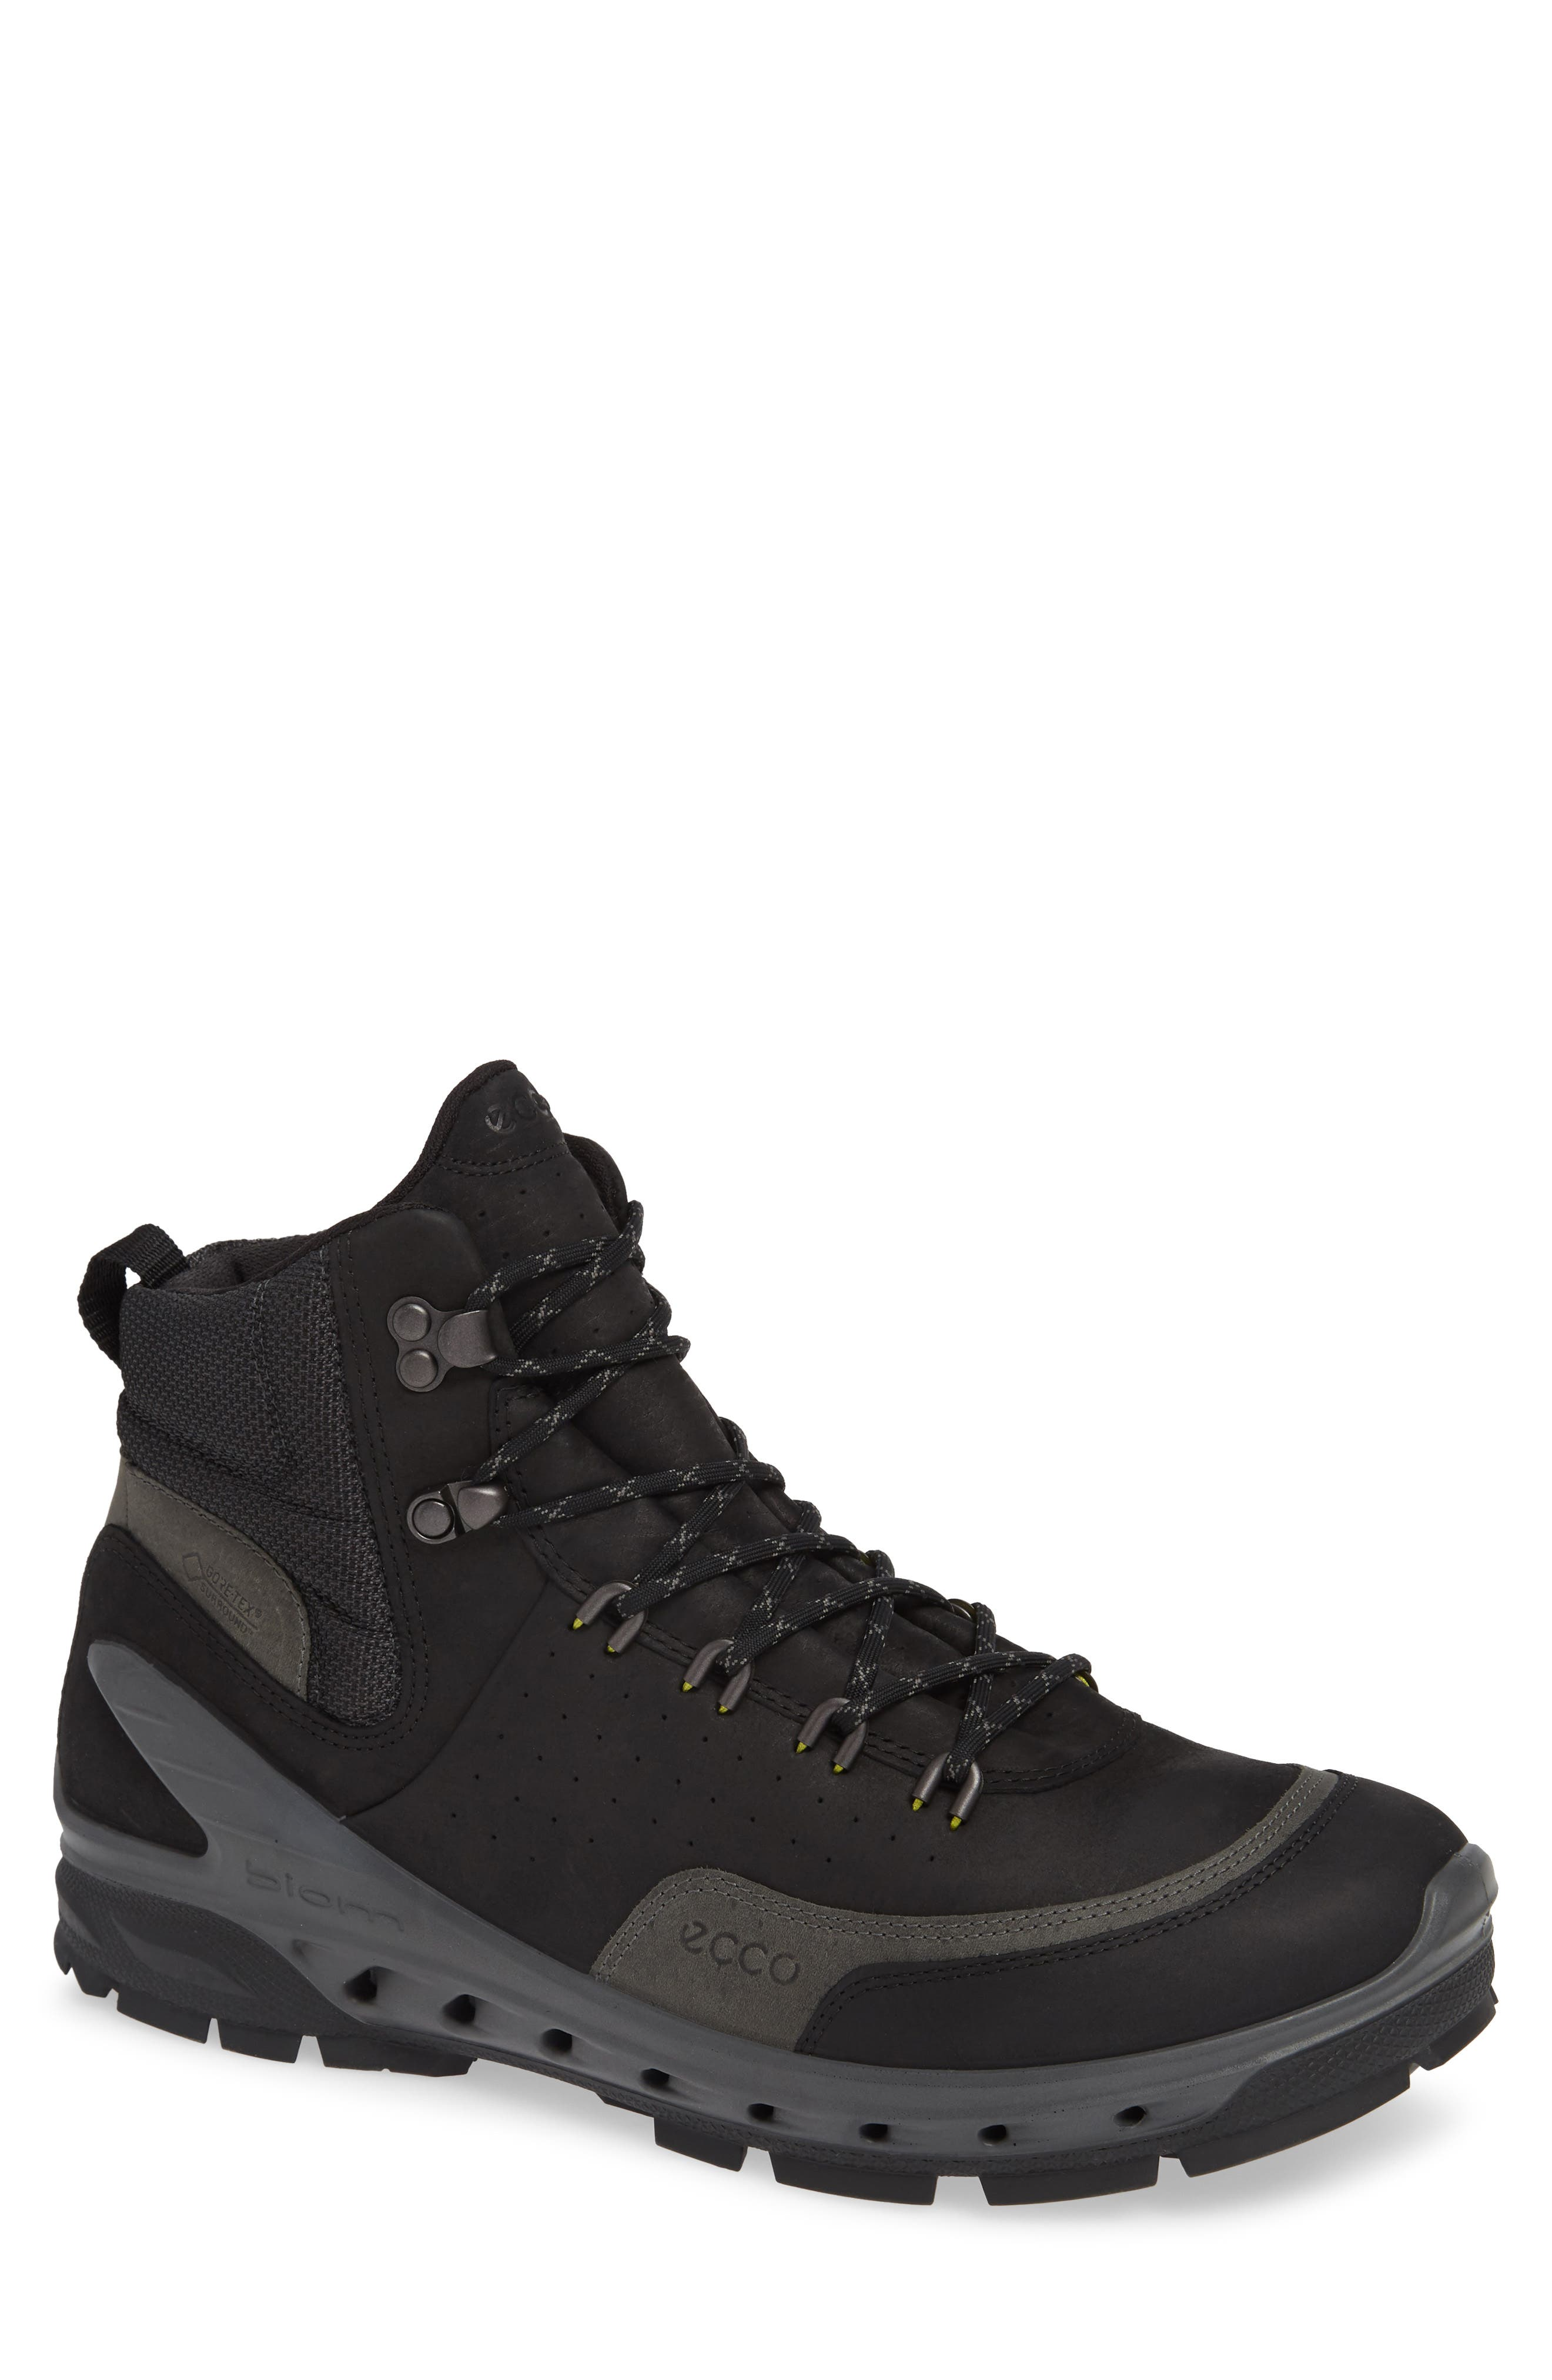 UPC 809704559278 product image for Men's Ecco Biom Venture Tr Gtx Boot, Size 6-6.5US / 40EU - Black | upcitemdb.com